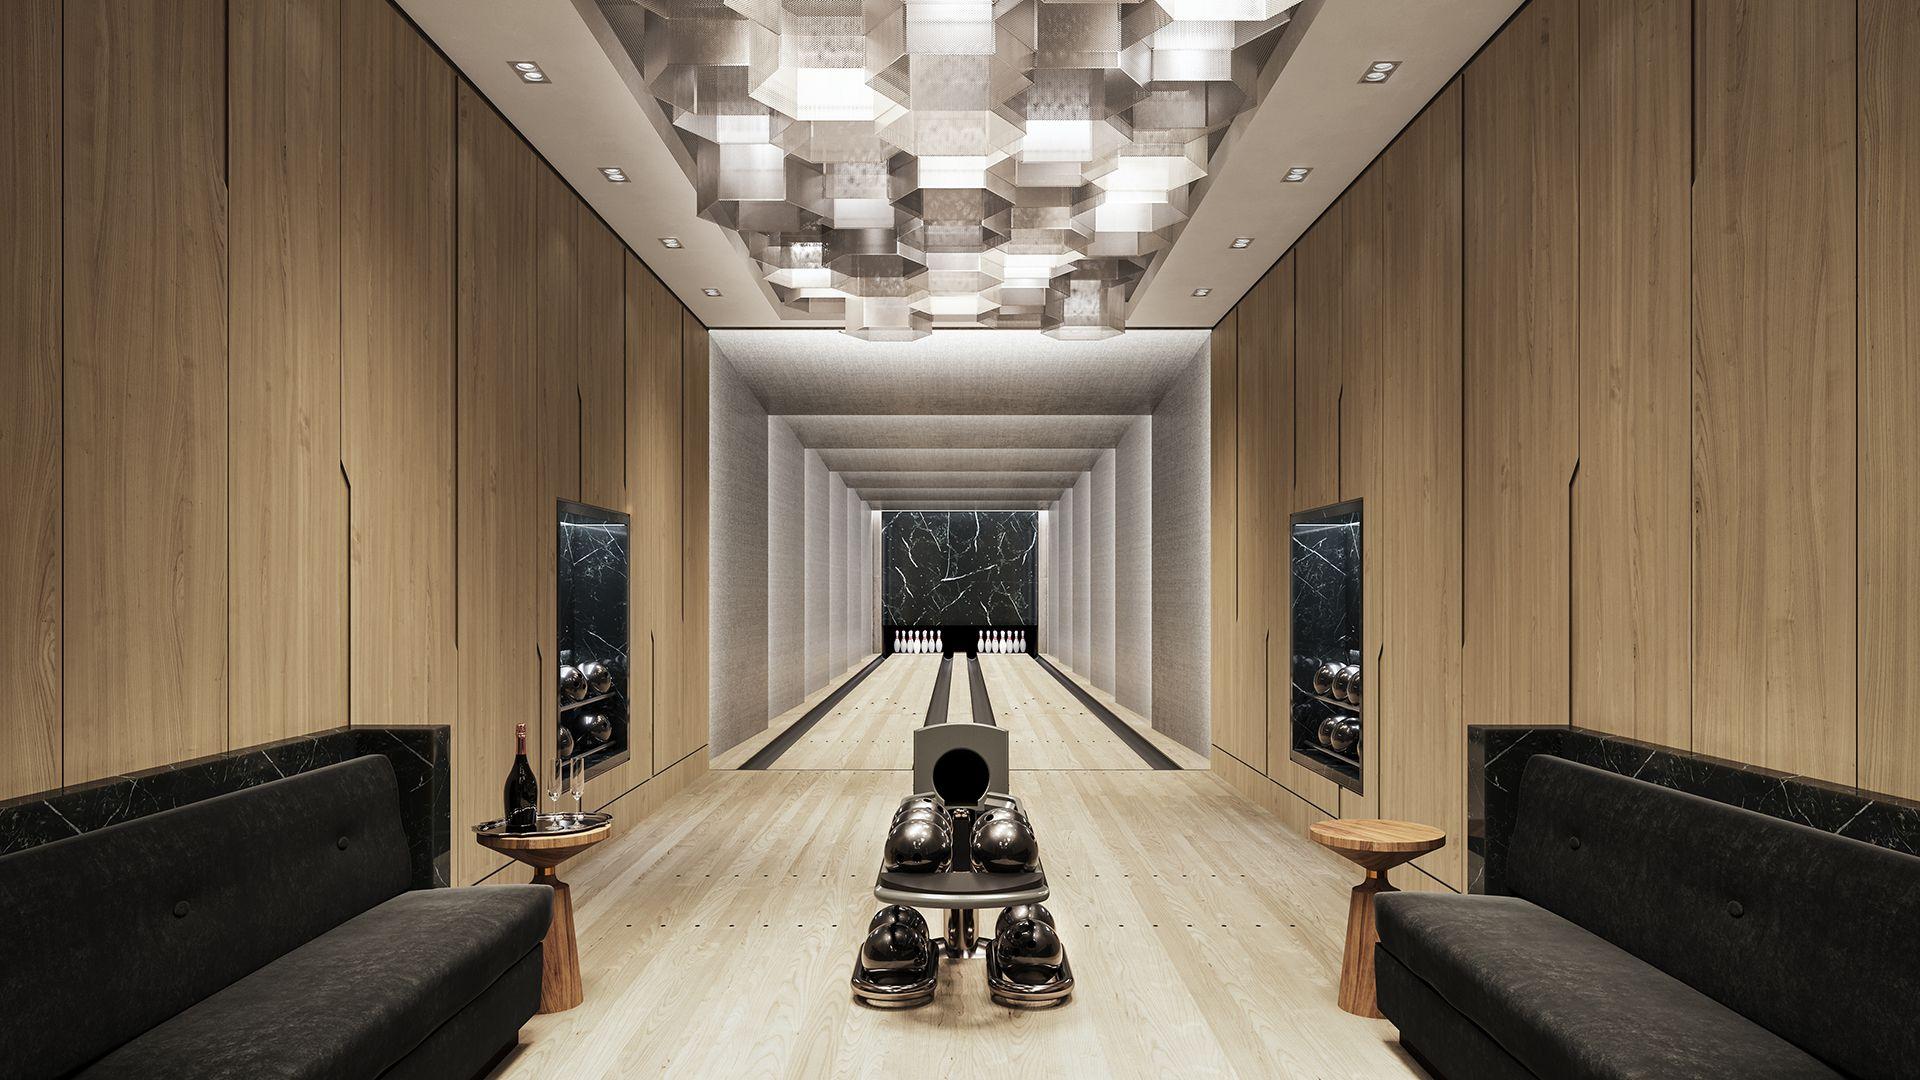 Luxurious Condo Amenities in New York City - Waterline